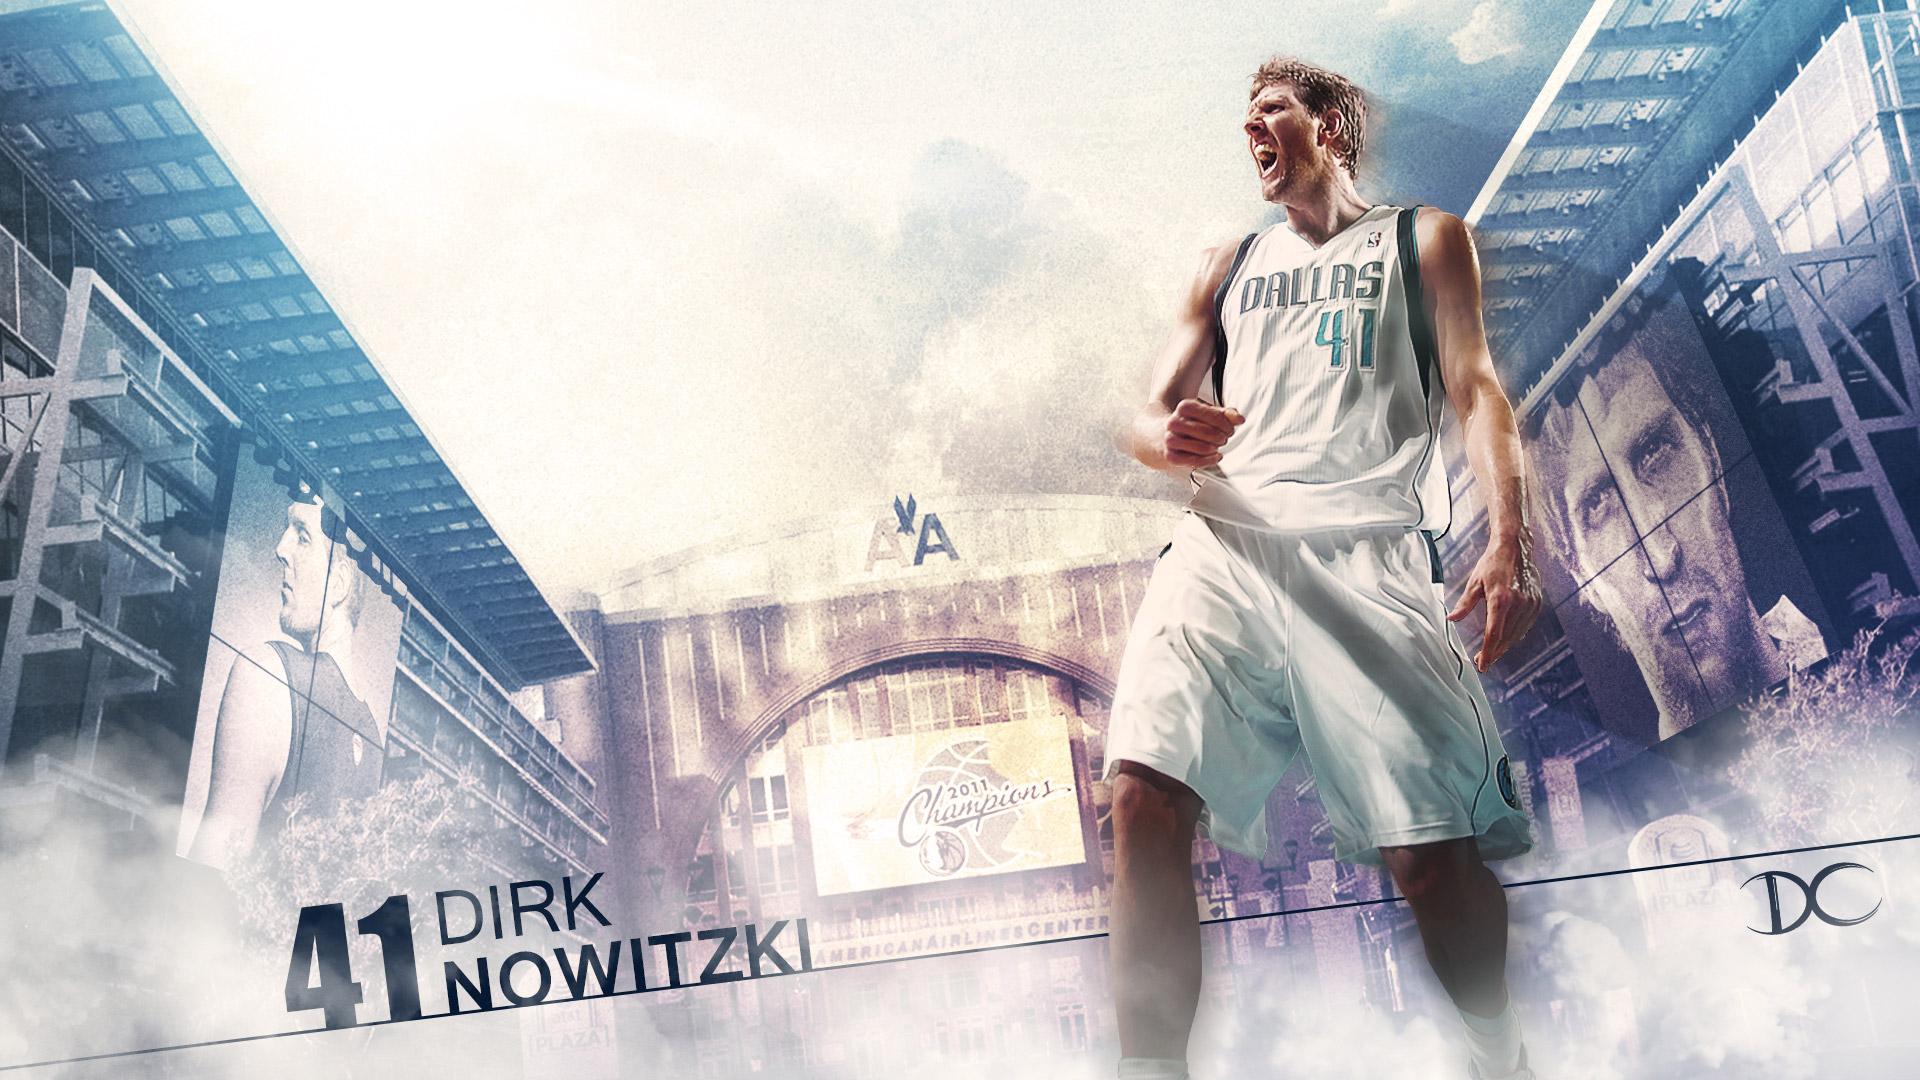 Dallas Stars Wallpaper Iphone Dirk Nowitzki Legacy 2014 Wallpaper Basketball